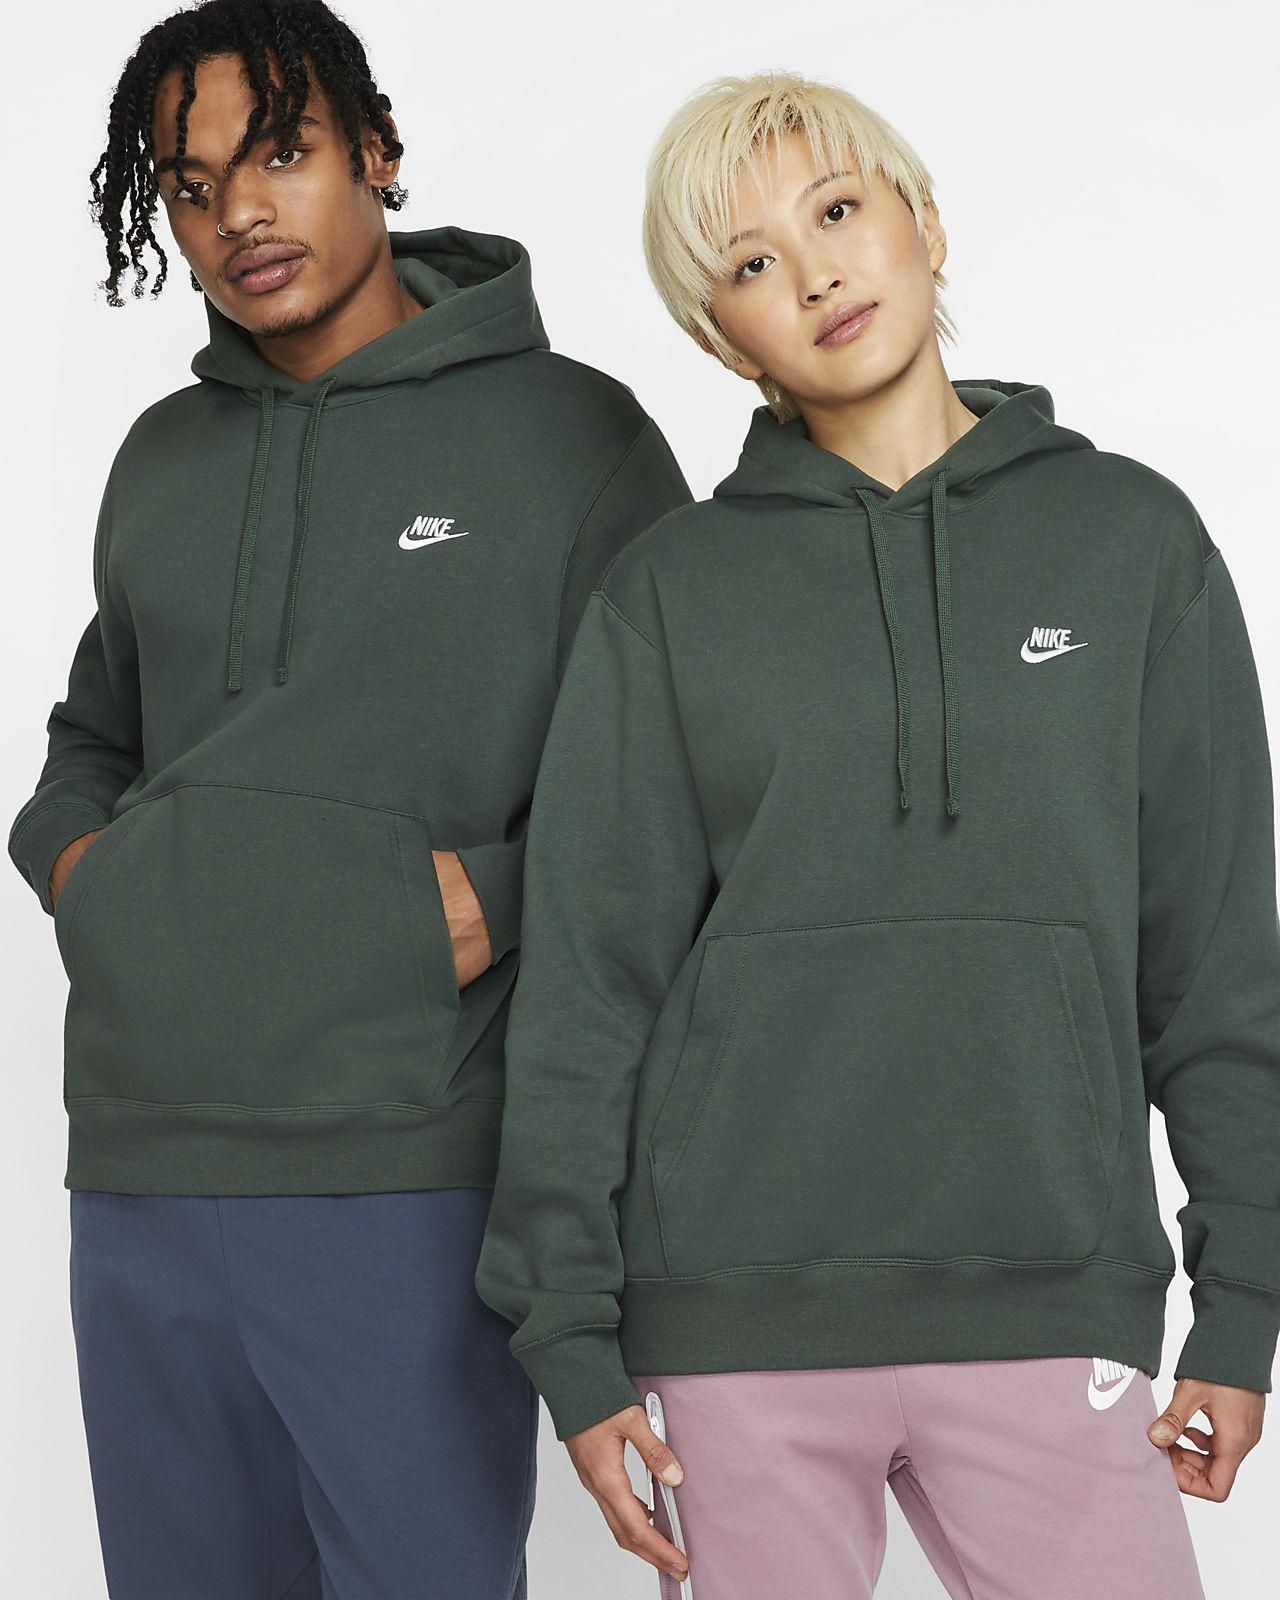 11913da6 Nike Sportswear Club fleecehettegenser til herre. Nike.com NO